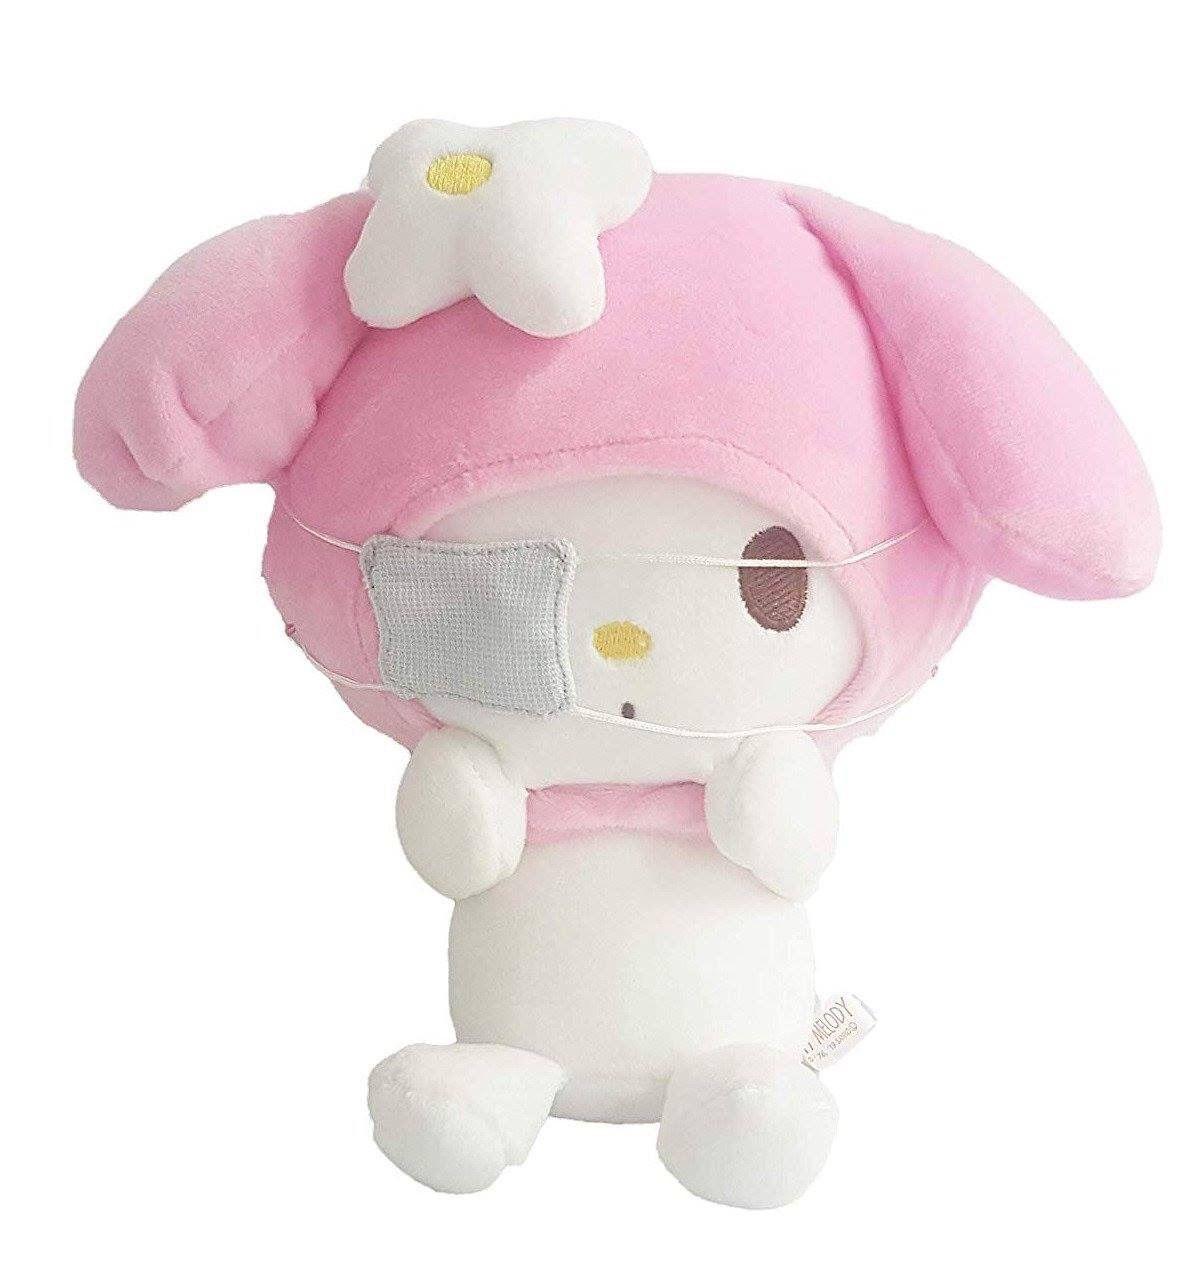 Hello Kitty Sanrio Plush doll Stuffed toy Hot warmer S Japan Gift New Free Ship